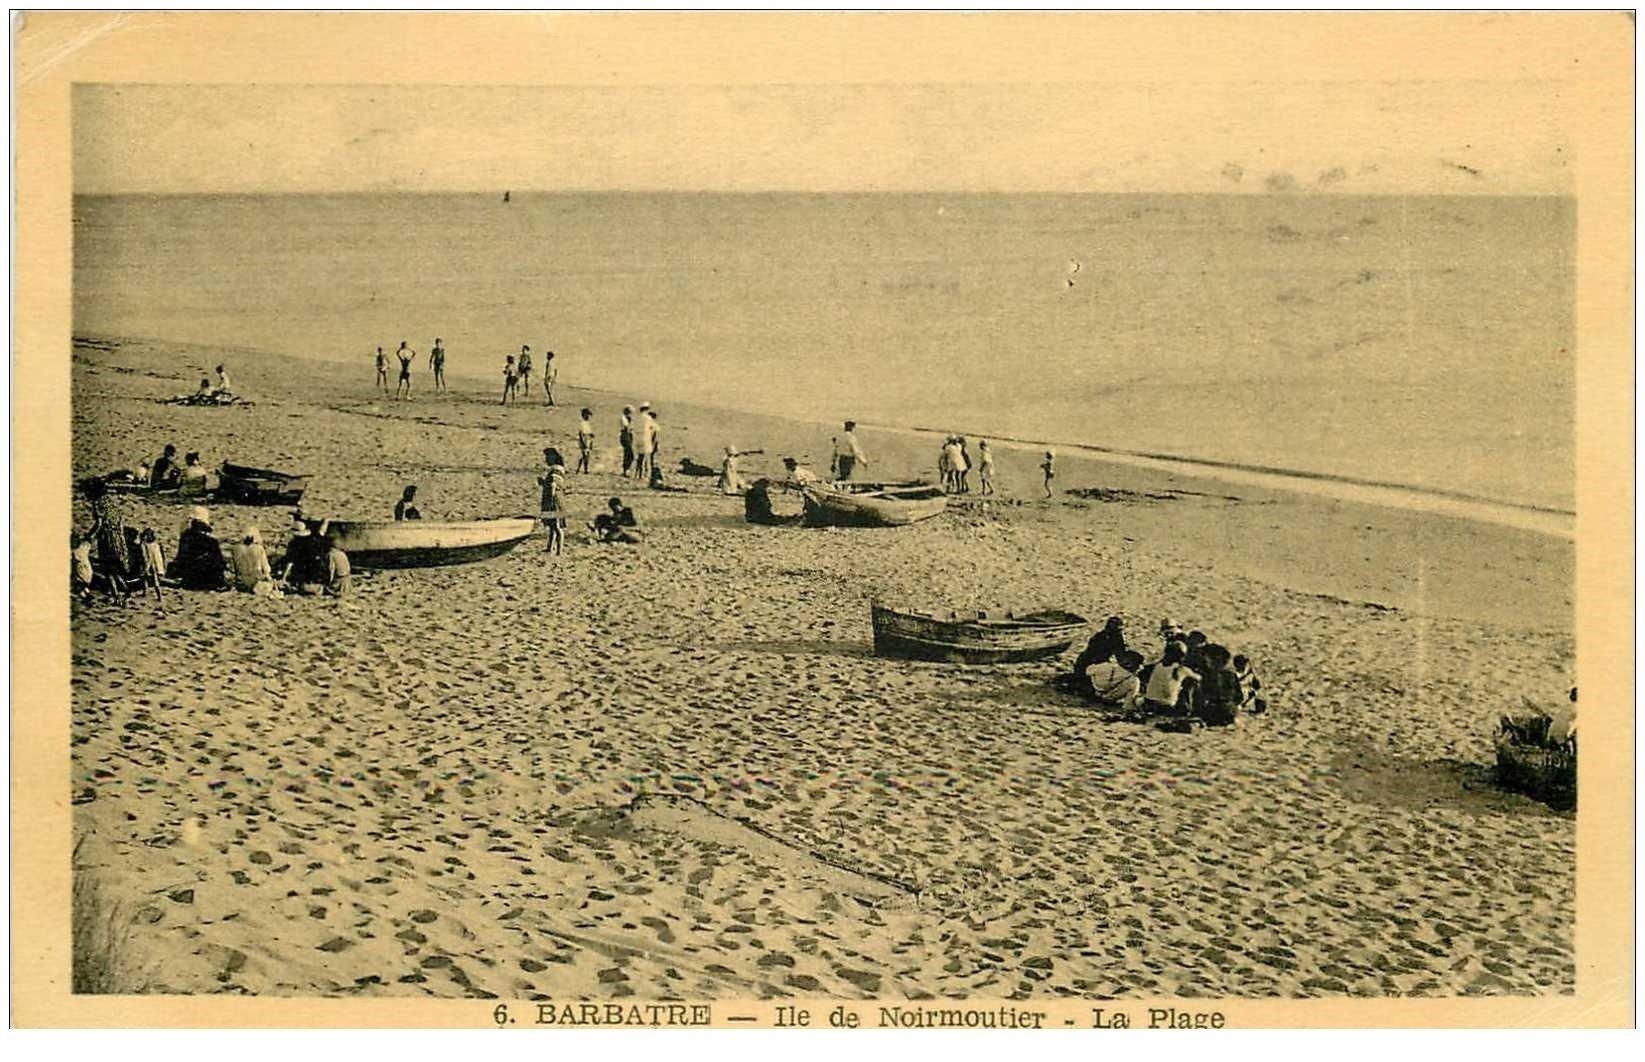 85 BARBATRE. Ile de Noirmoutier la Plage 1949